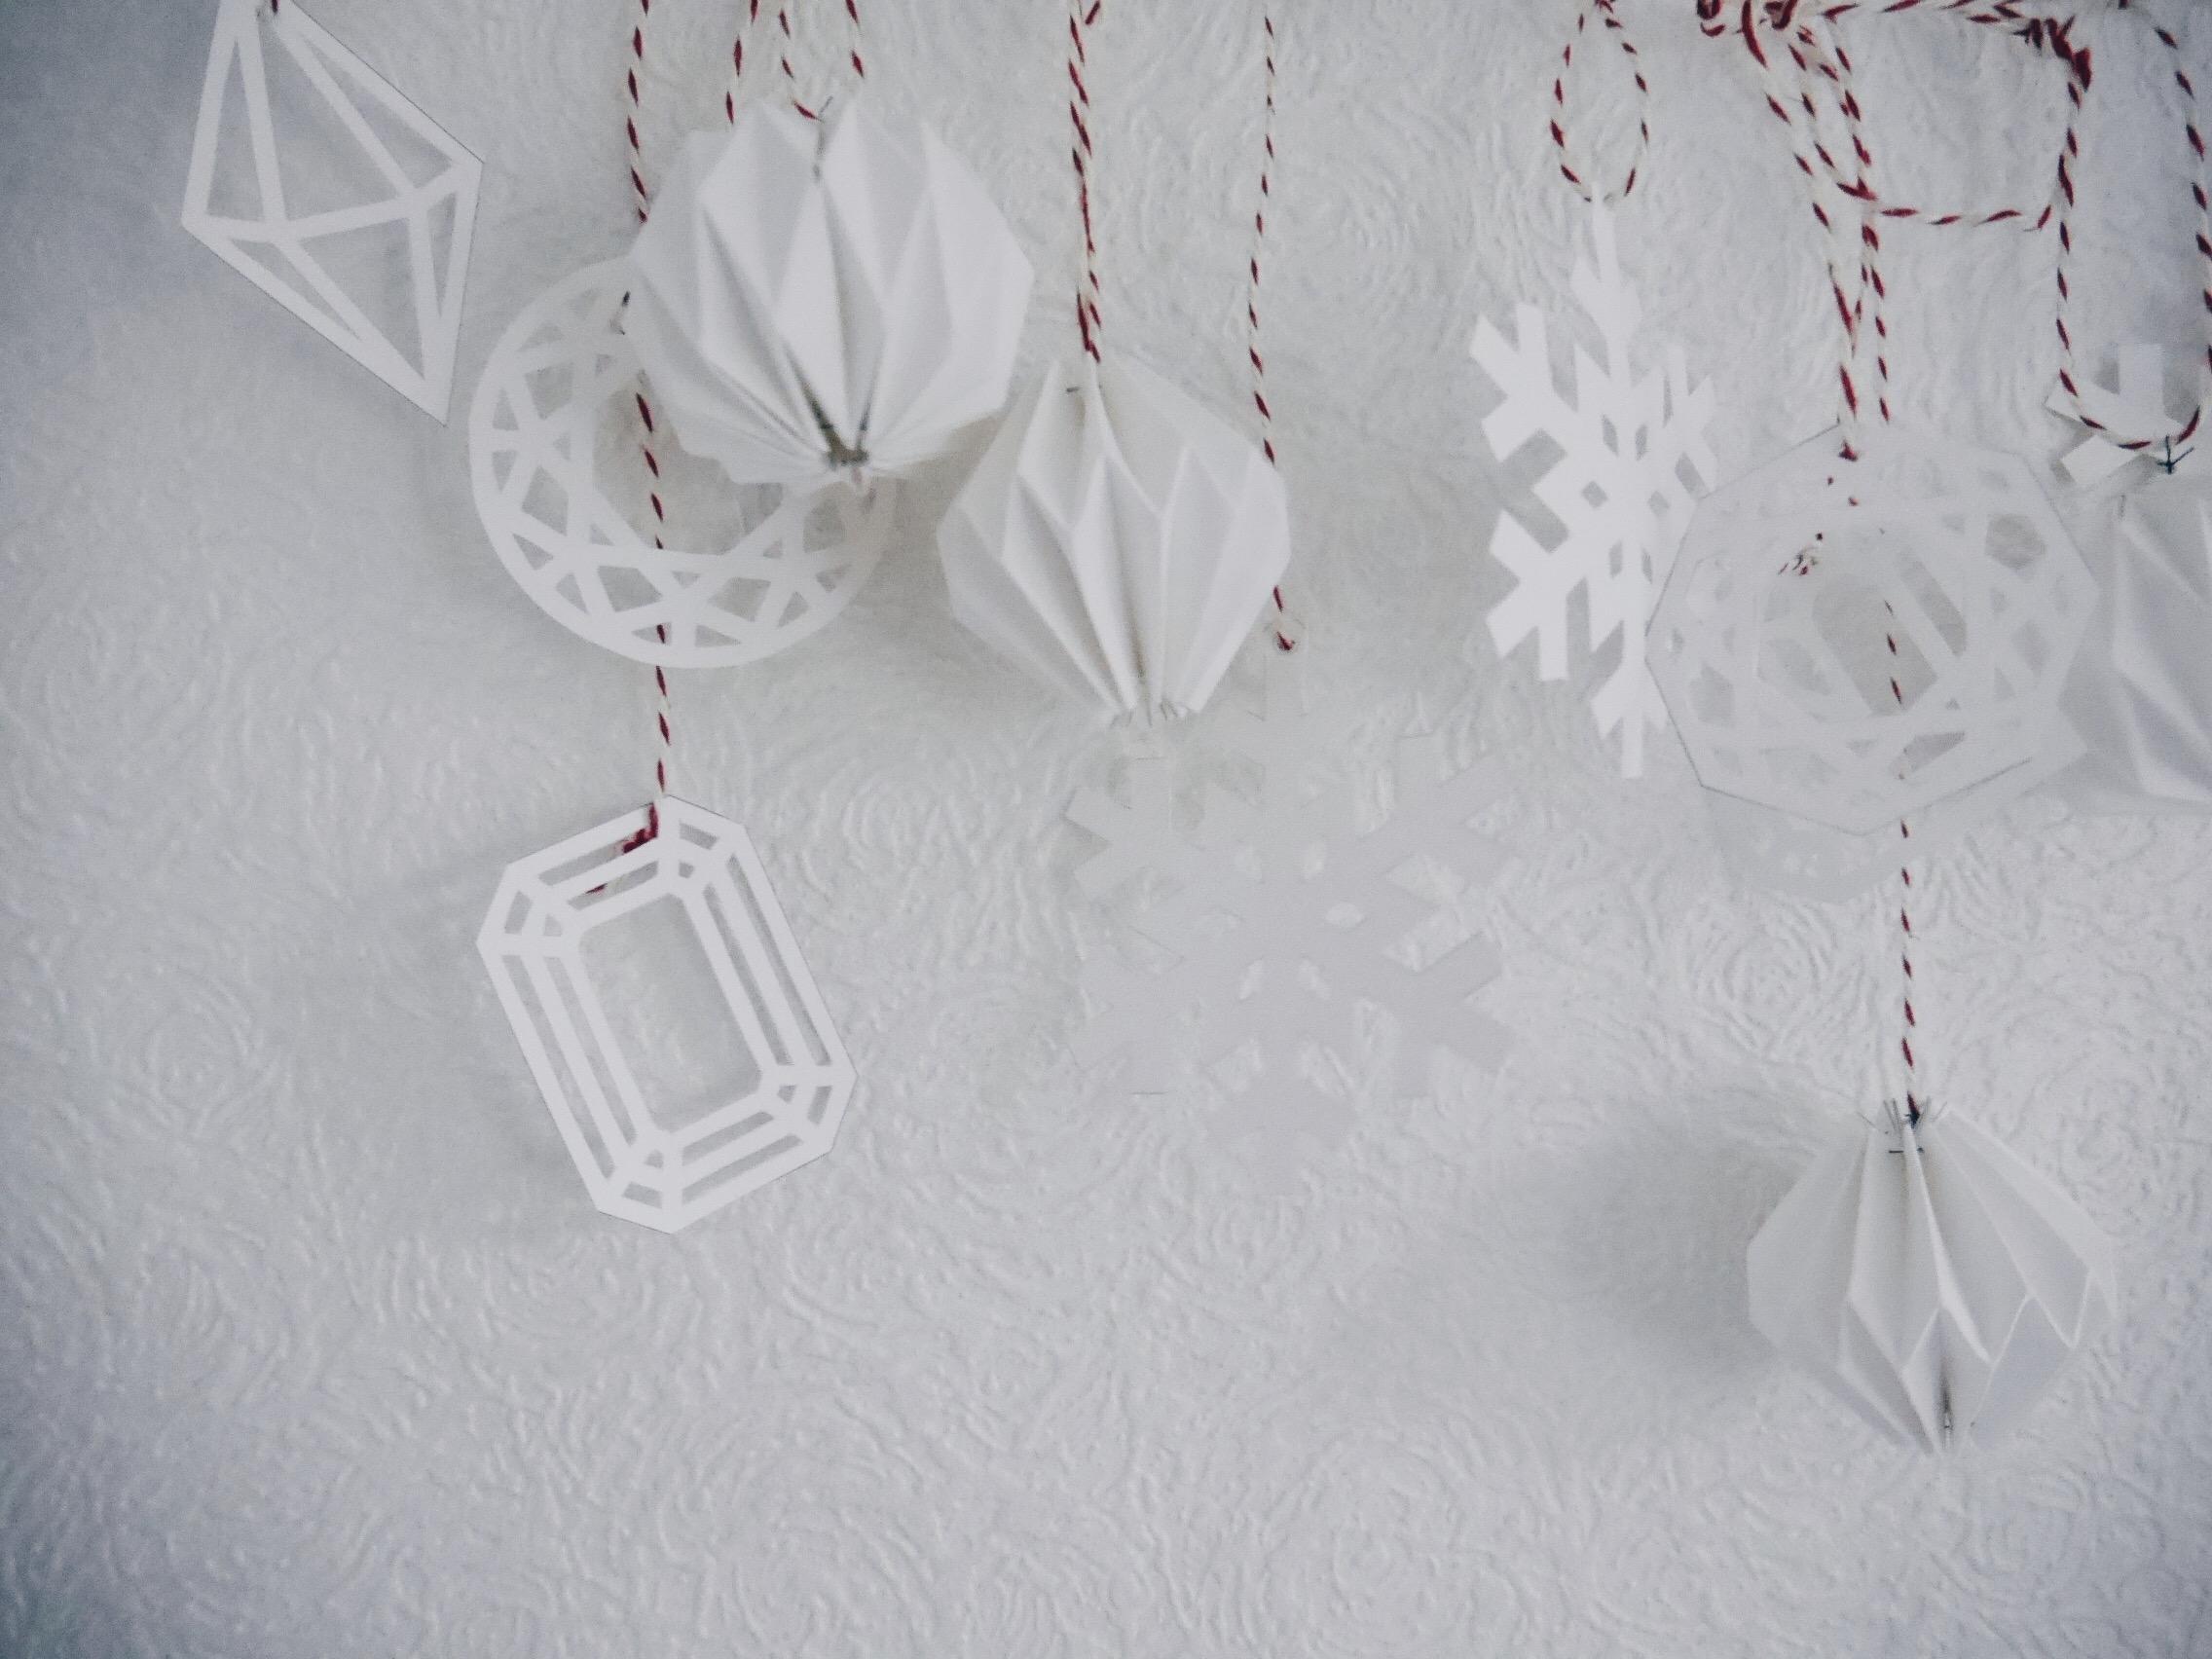 blog:2016:12:diy-paper-christmas-decorations(9).jpg